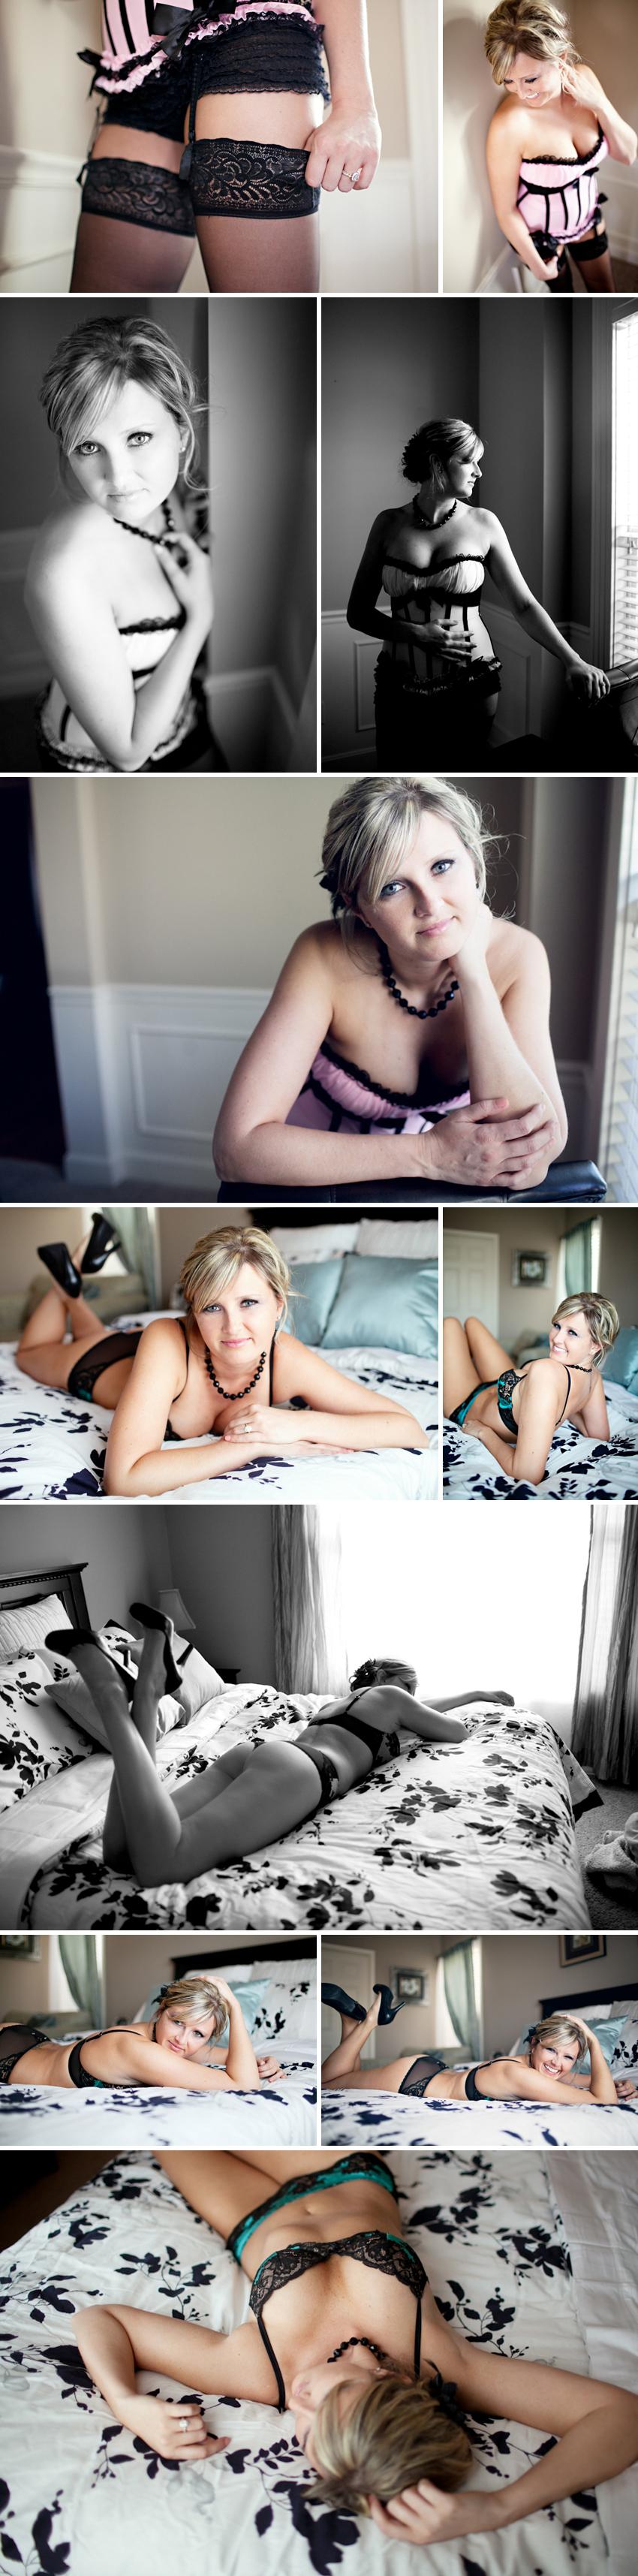 KansasCity-boudoir-photography-MRSJ-comp001